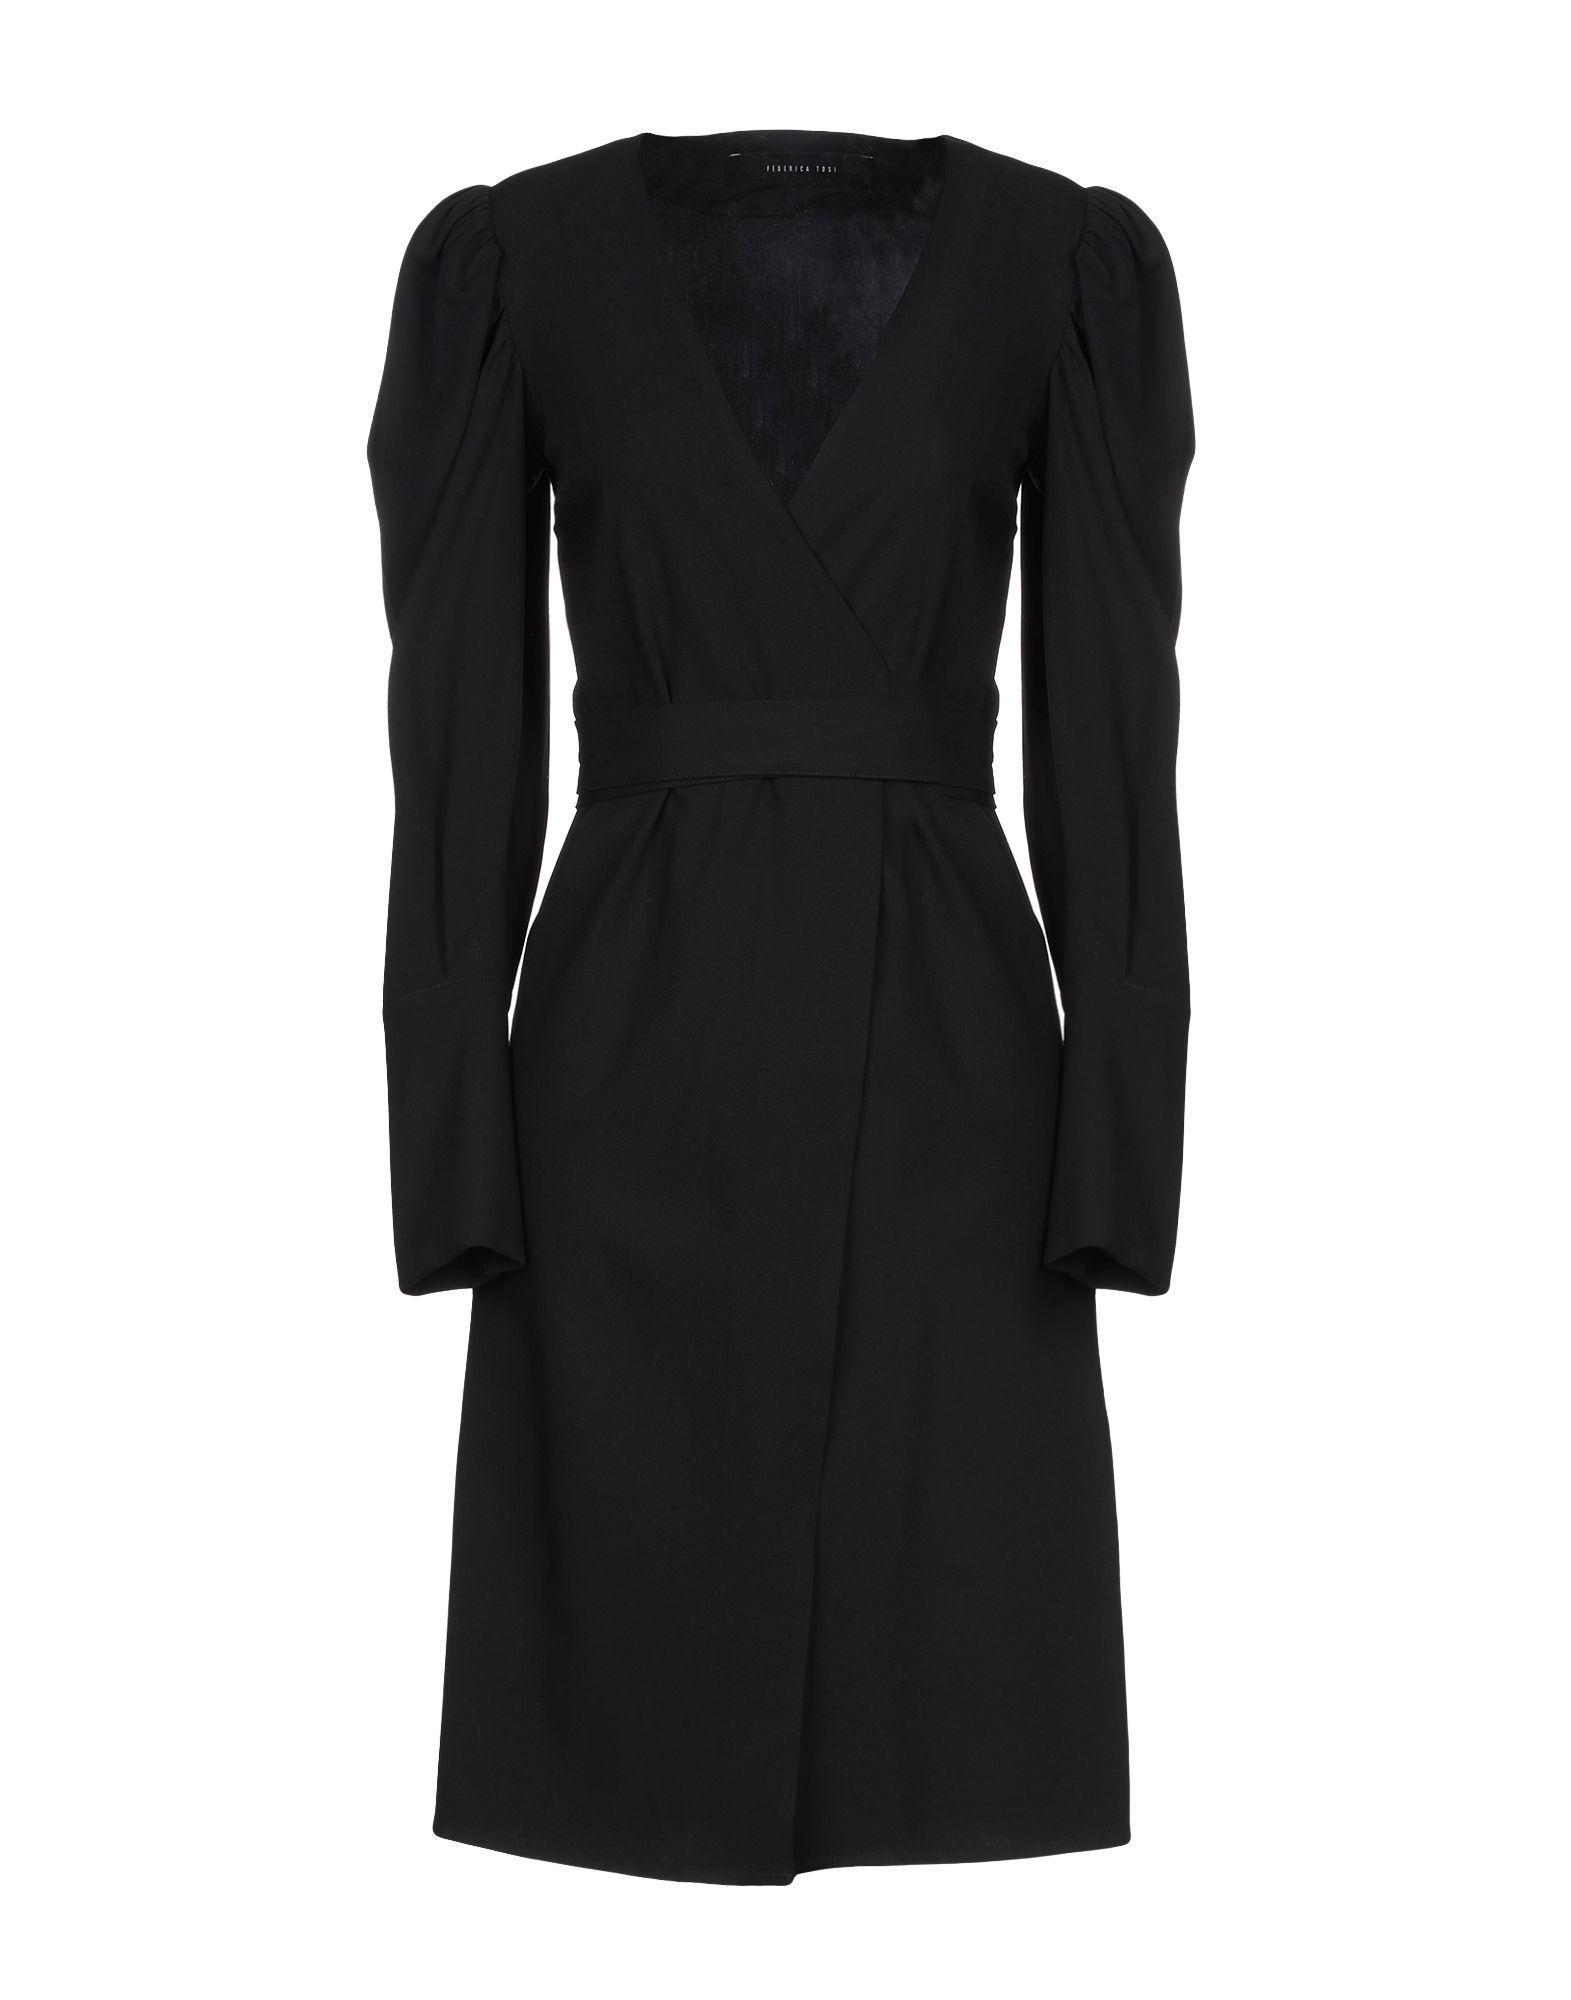 Federica Tosi Black Long Sleeve Dress